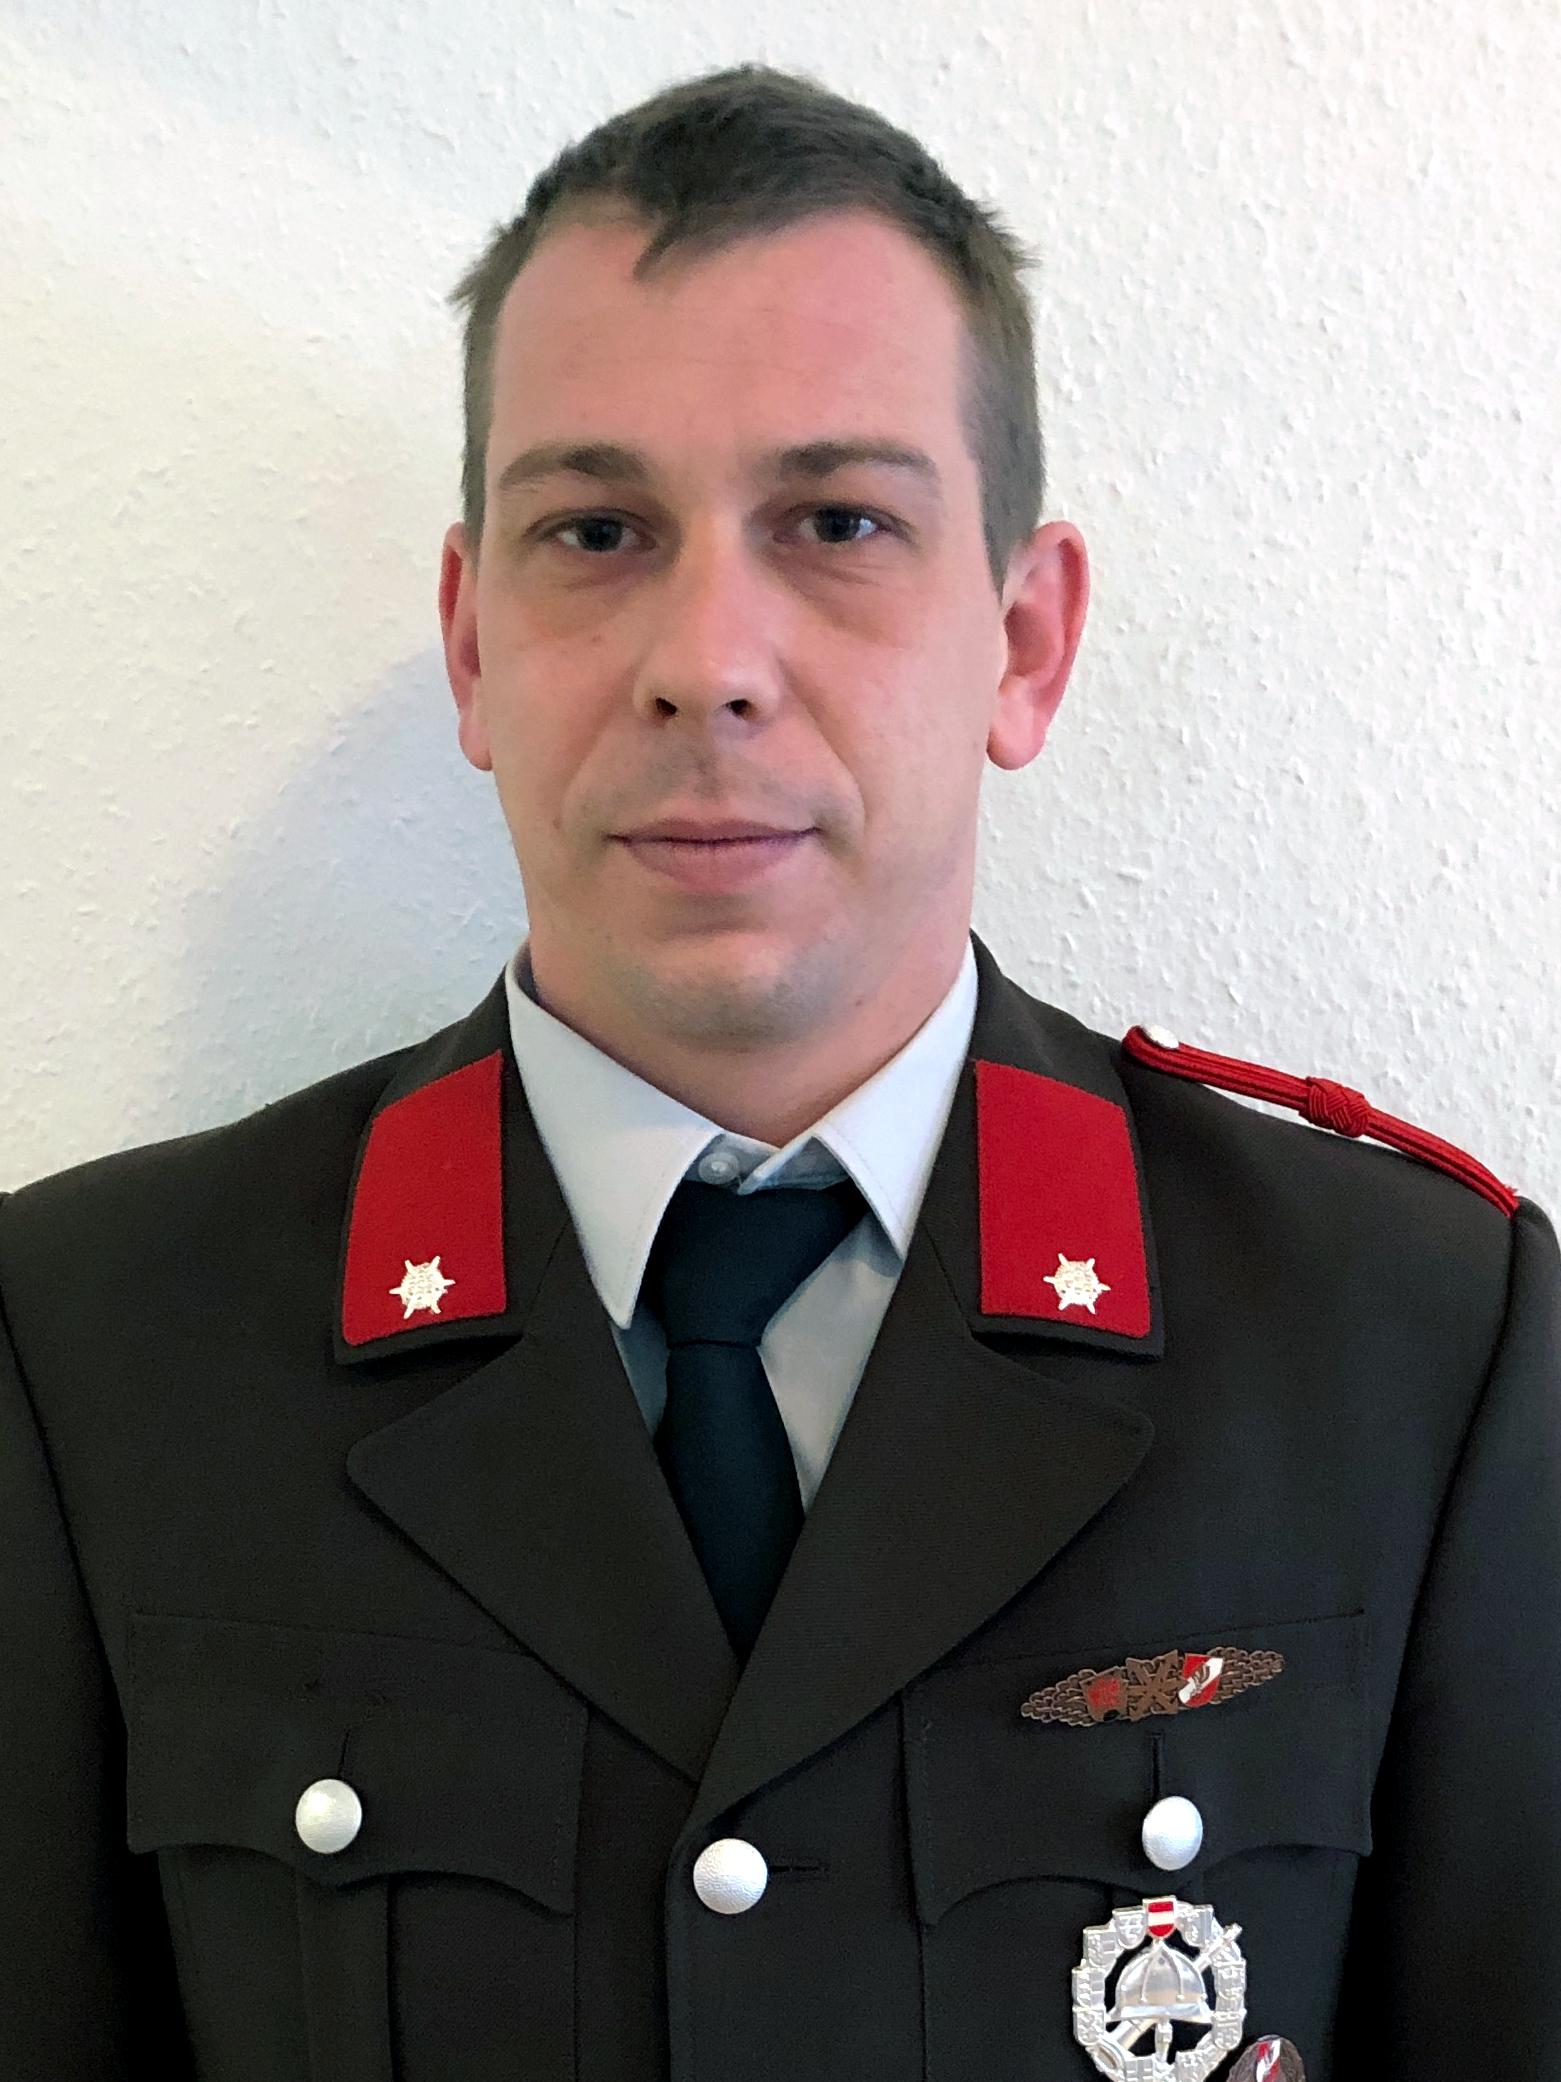 FM Halper Marco